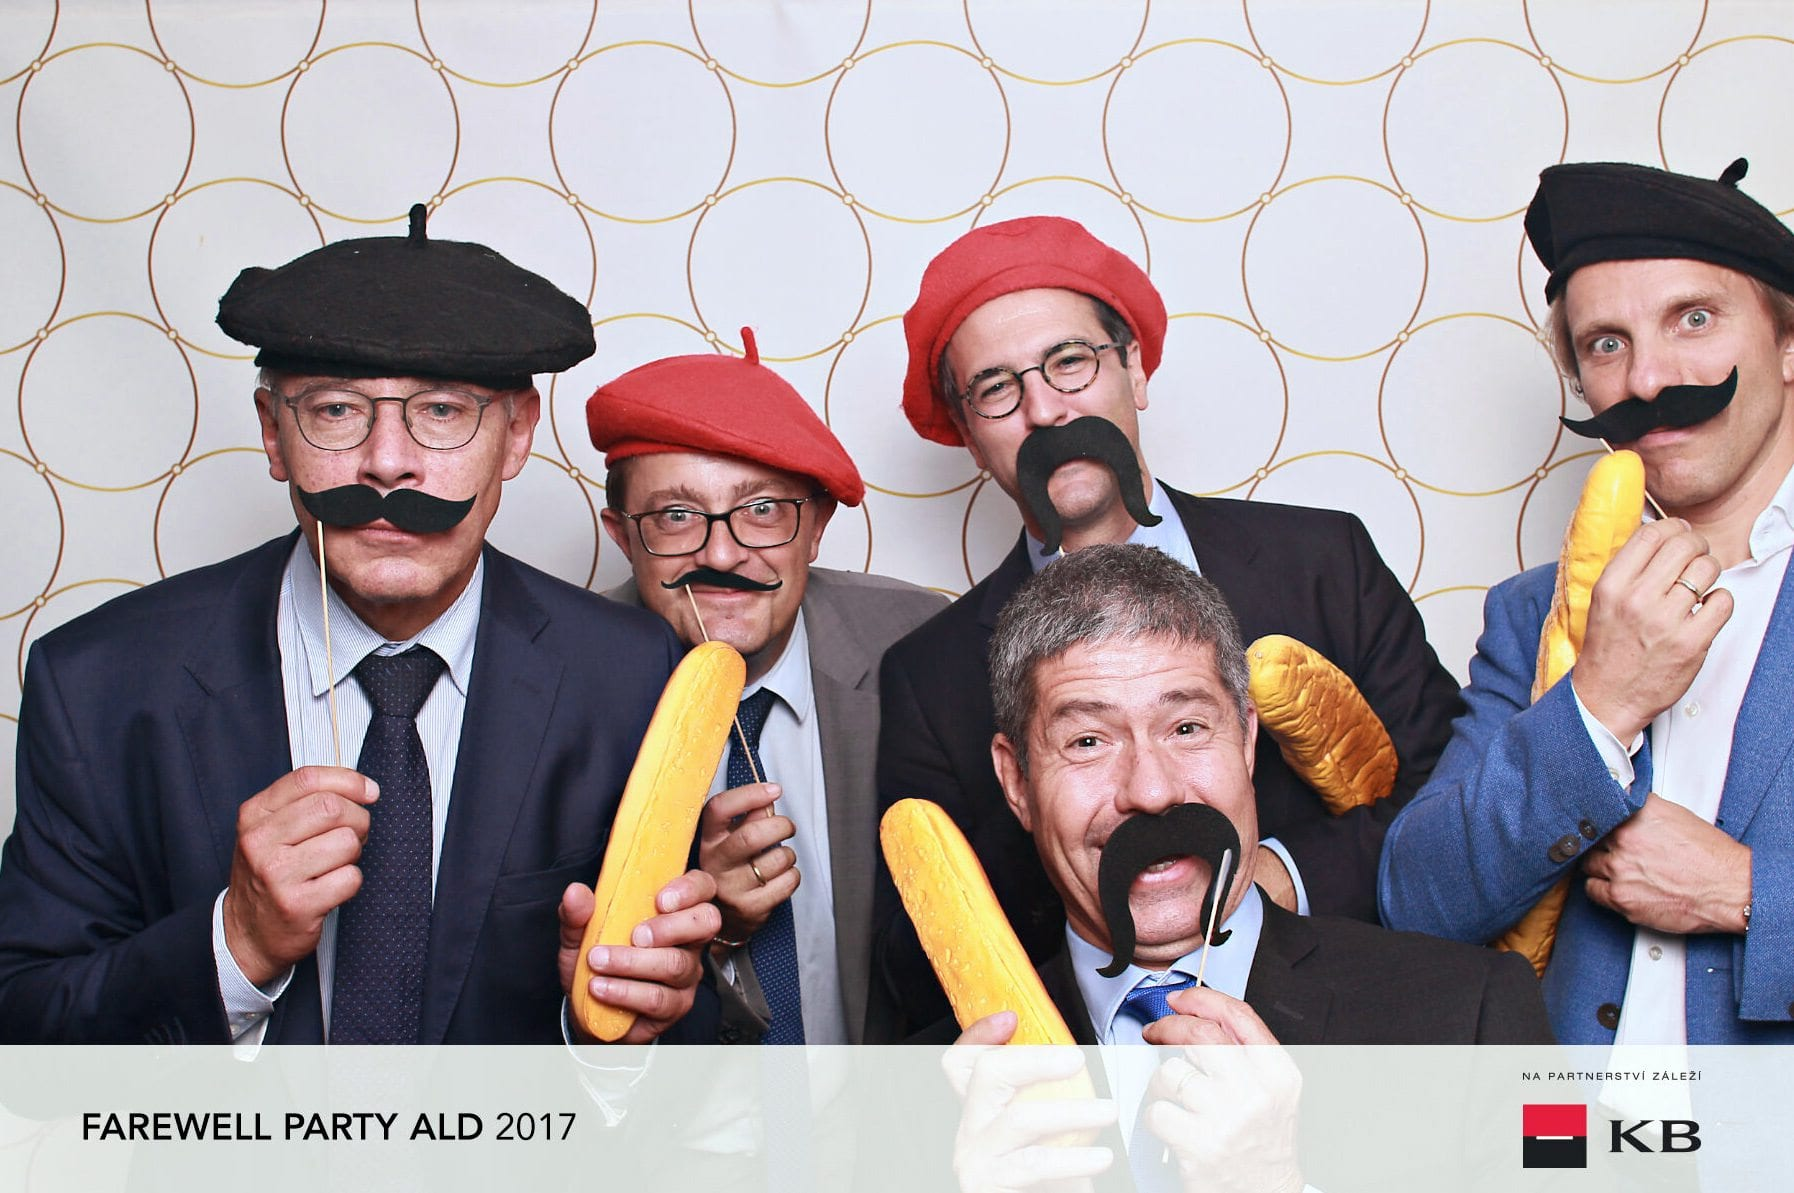 fotokoutek-kb-farewell-party-ald-2017-299624